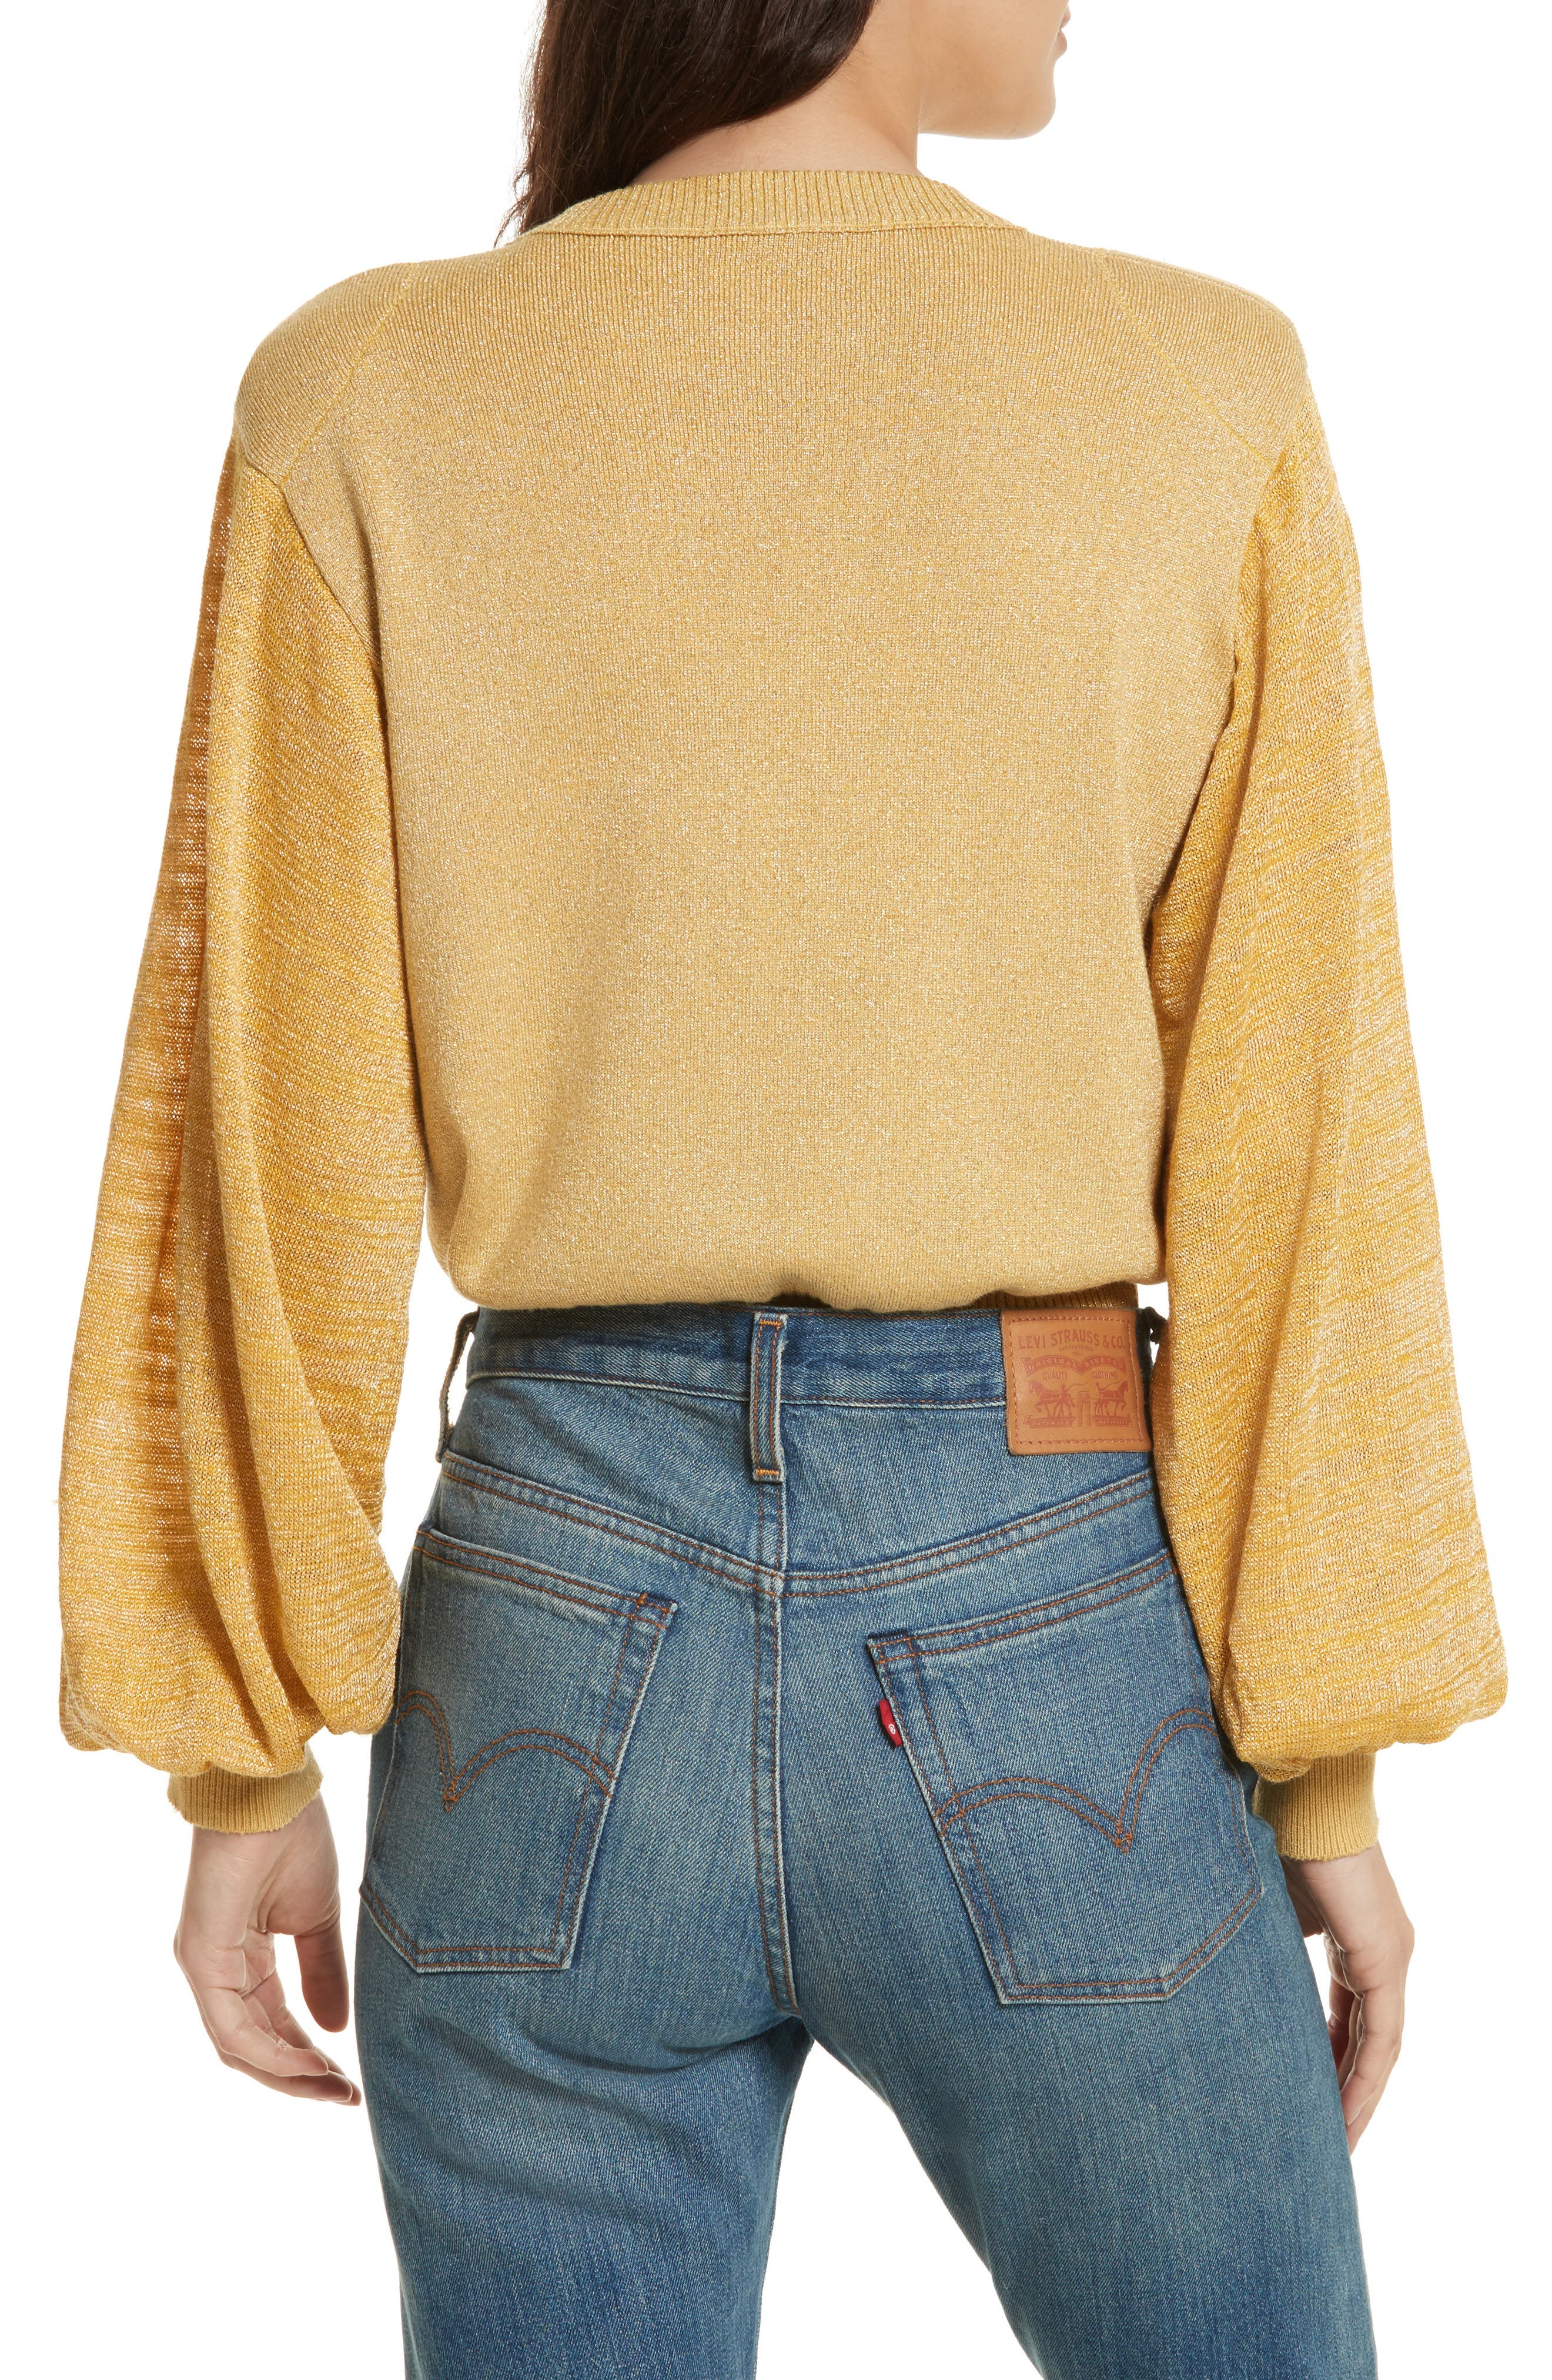 Let it Shine Sweater,                             Alternate thumbnail 5, color,